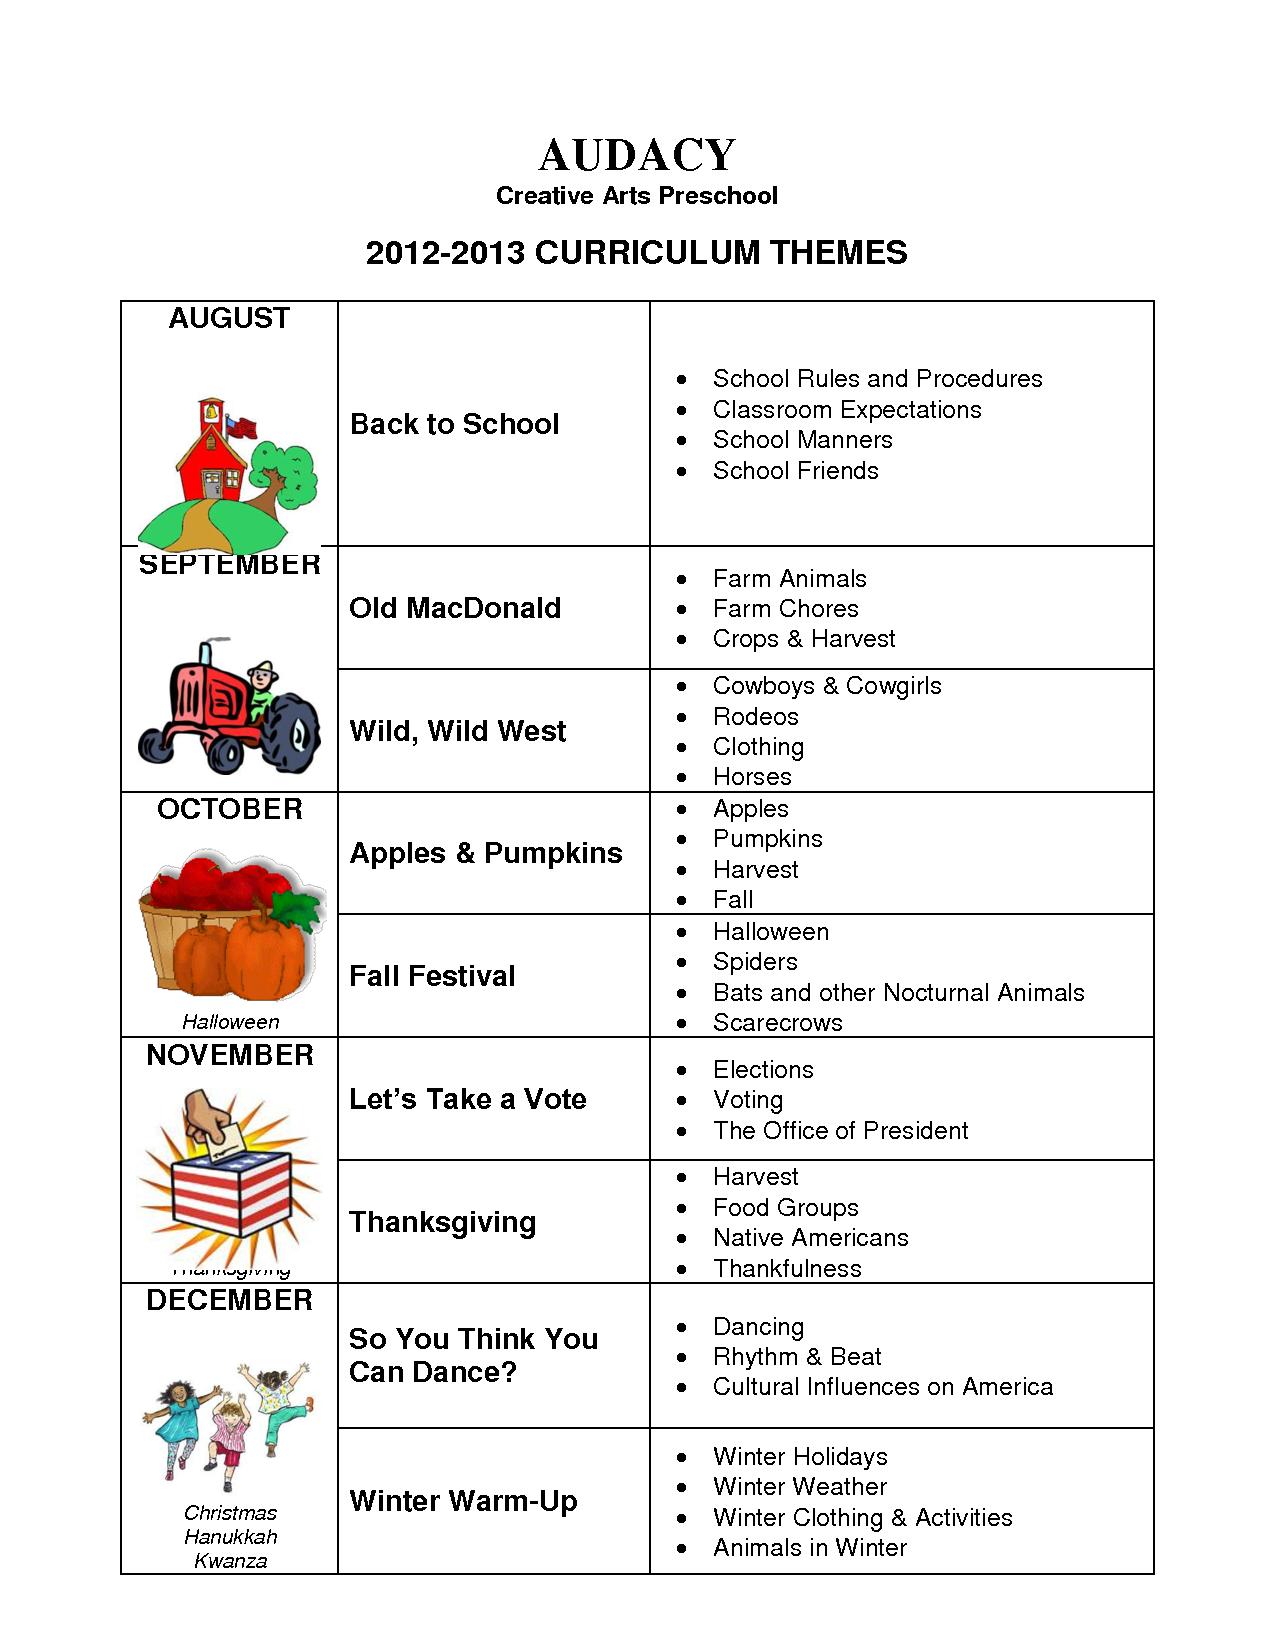 October Calendar Ideas For Preschool : Preschool monthly theme ideas google search calendar